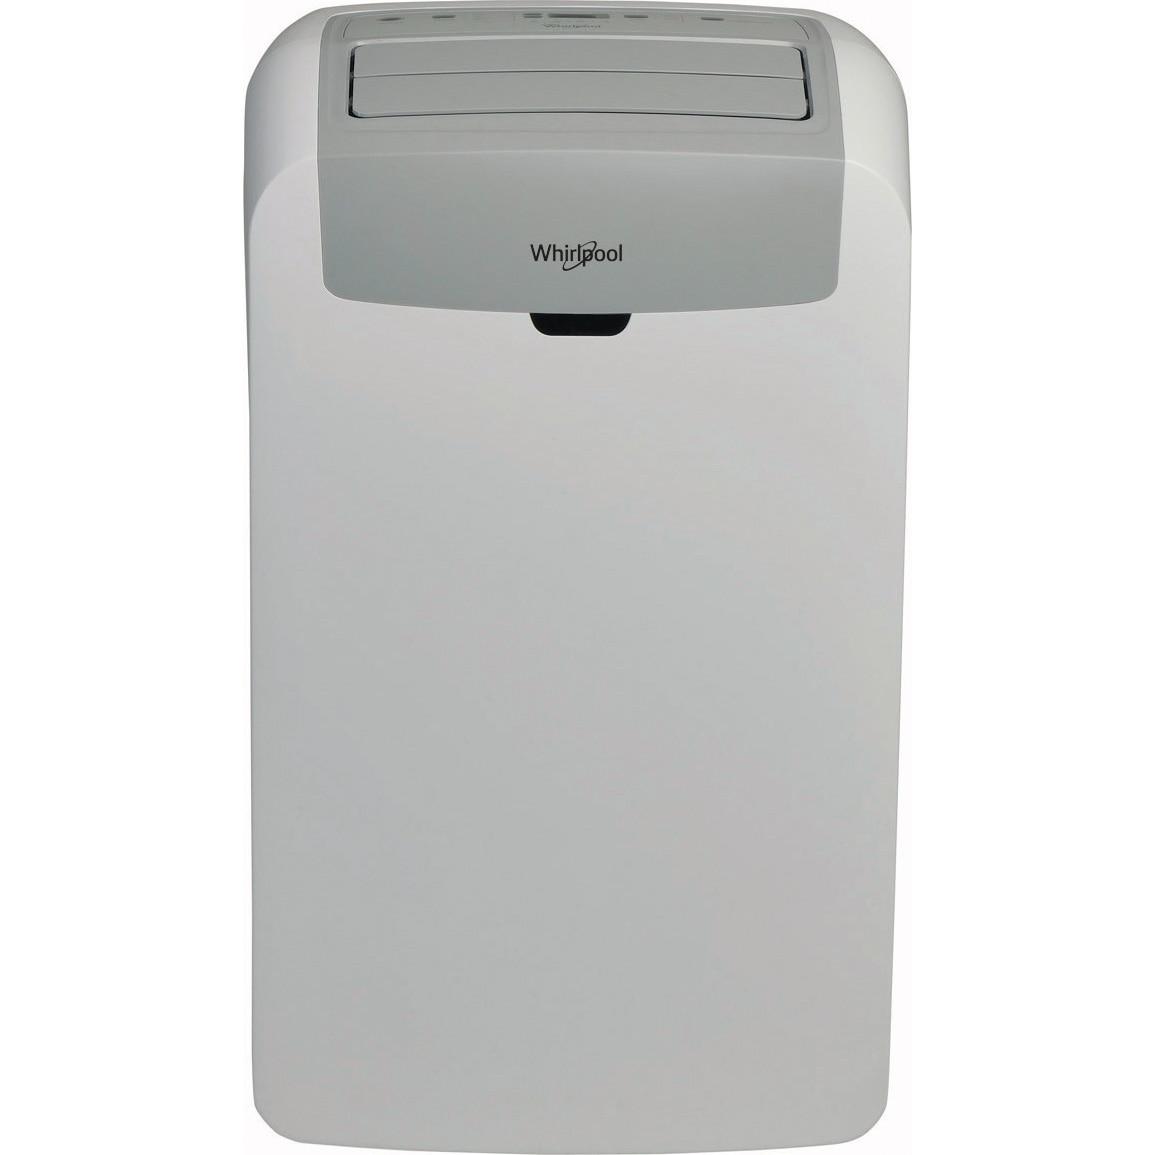 Fotografie Aparat de aer conditionat portabil Whirlpool 12000 BTU, Clasa A, filtru Hepa, kit fereastra inclus, Alb